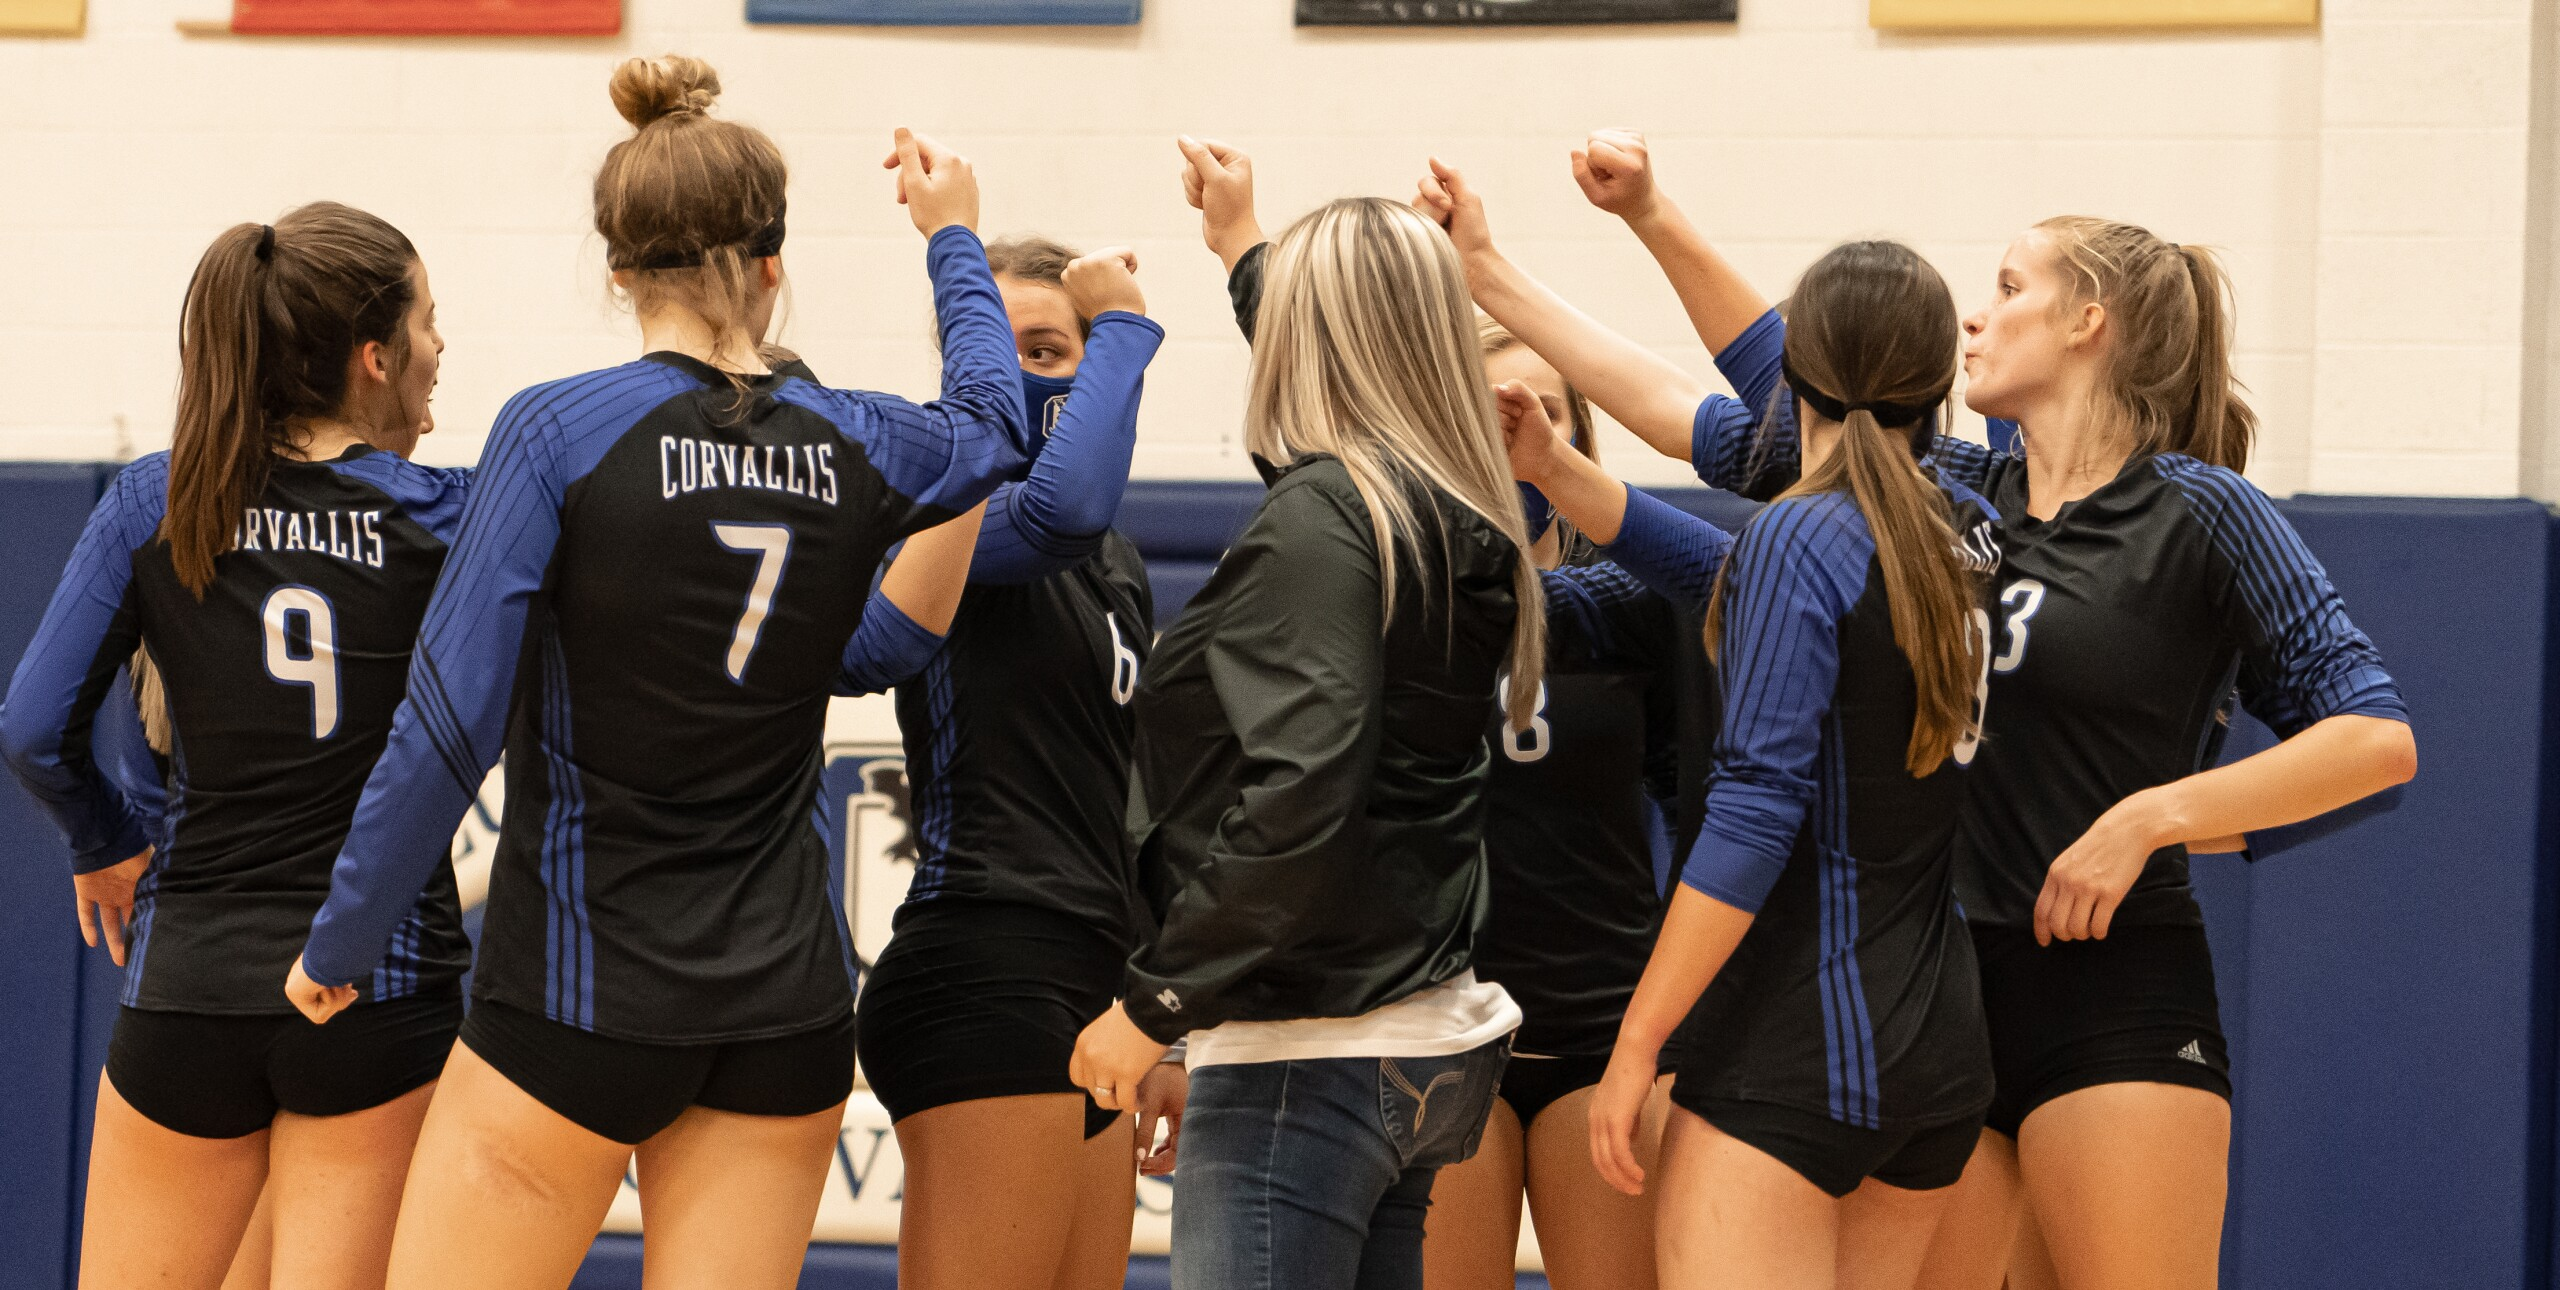 Corvallis volleyball team-2.jpg